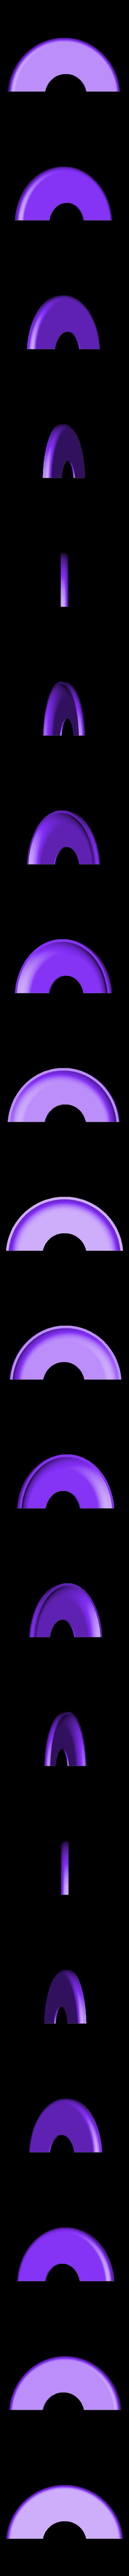 Color 3.1.stl Download free STL file Keychain Multicolor Pokemon • 3D printer template, dukedoks